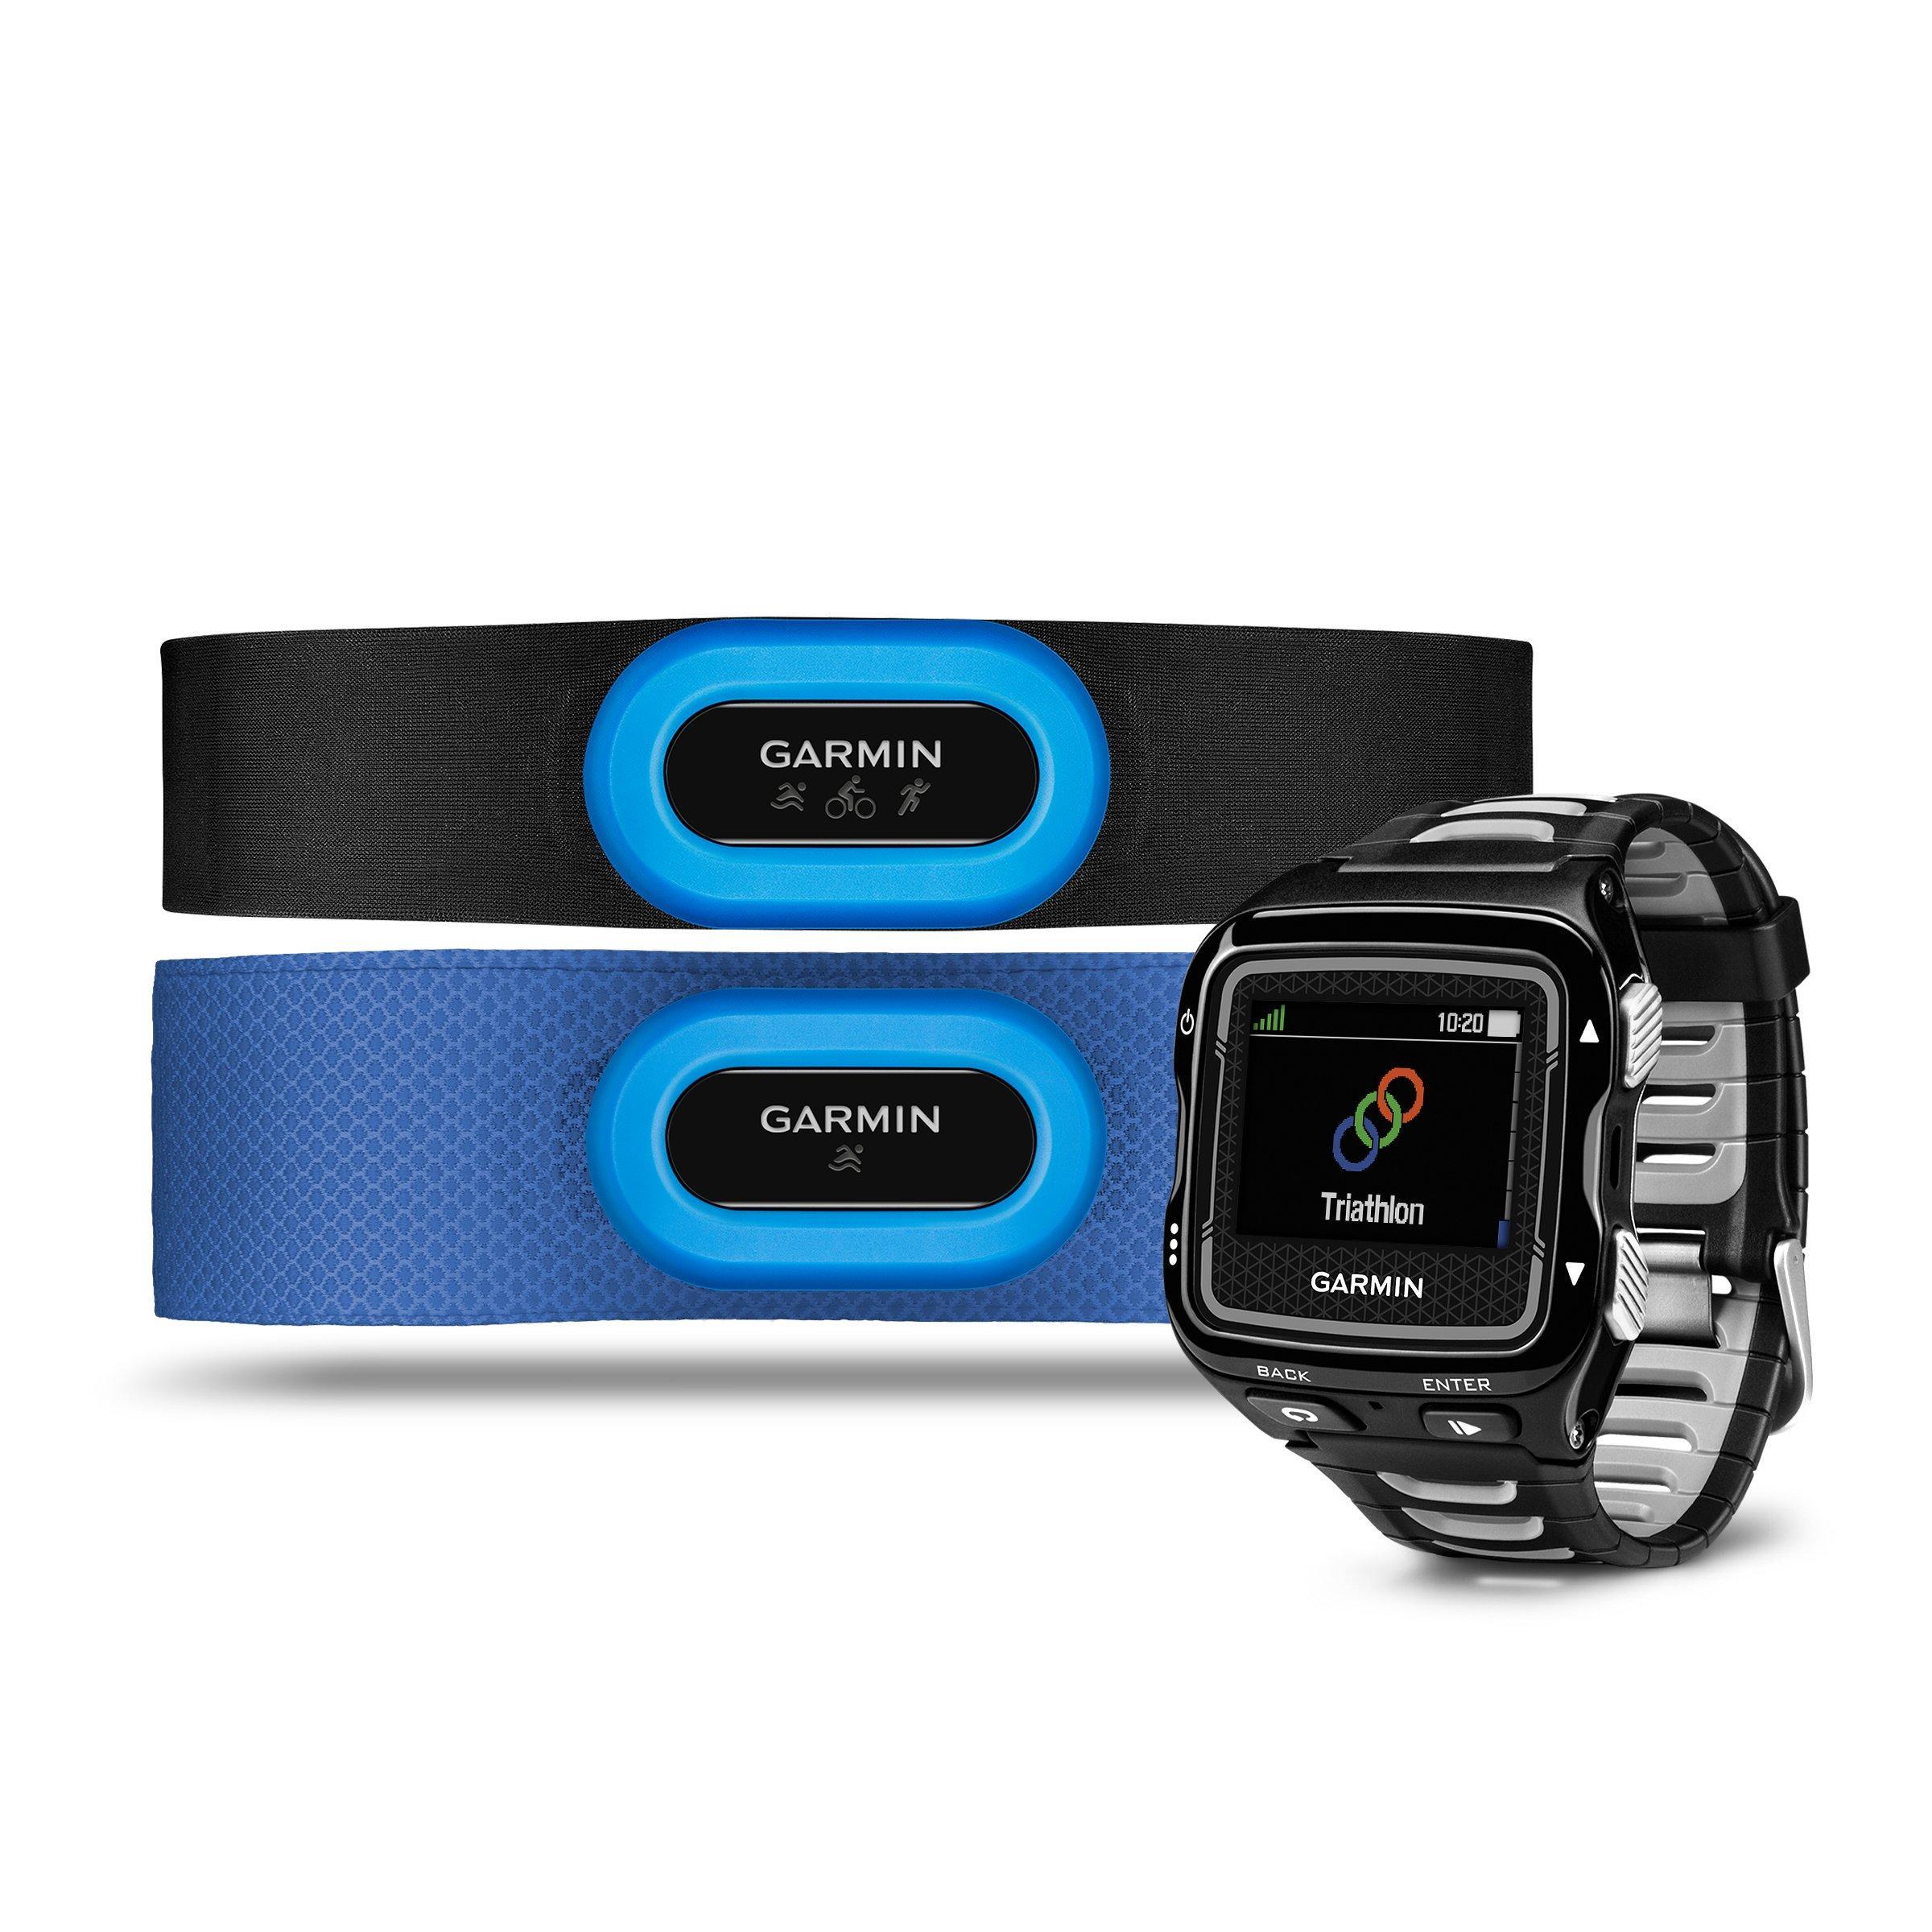 Garmin Forerunner 920 XT MultiSport GPS Watch Bundle  Black Black